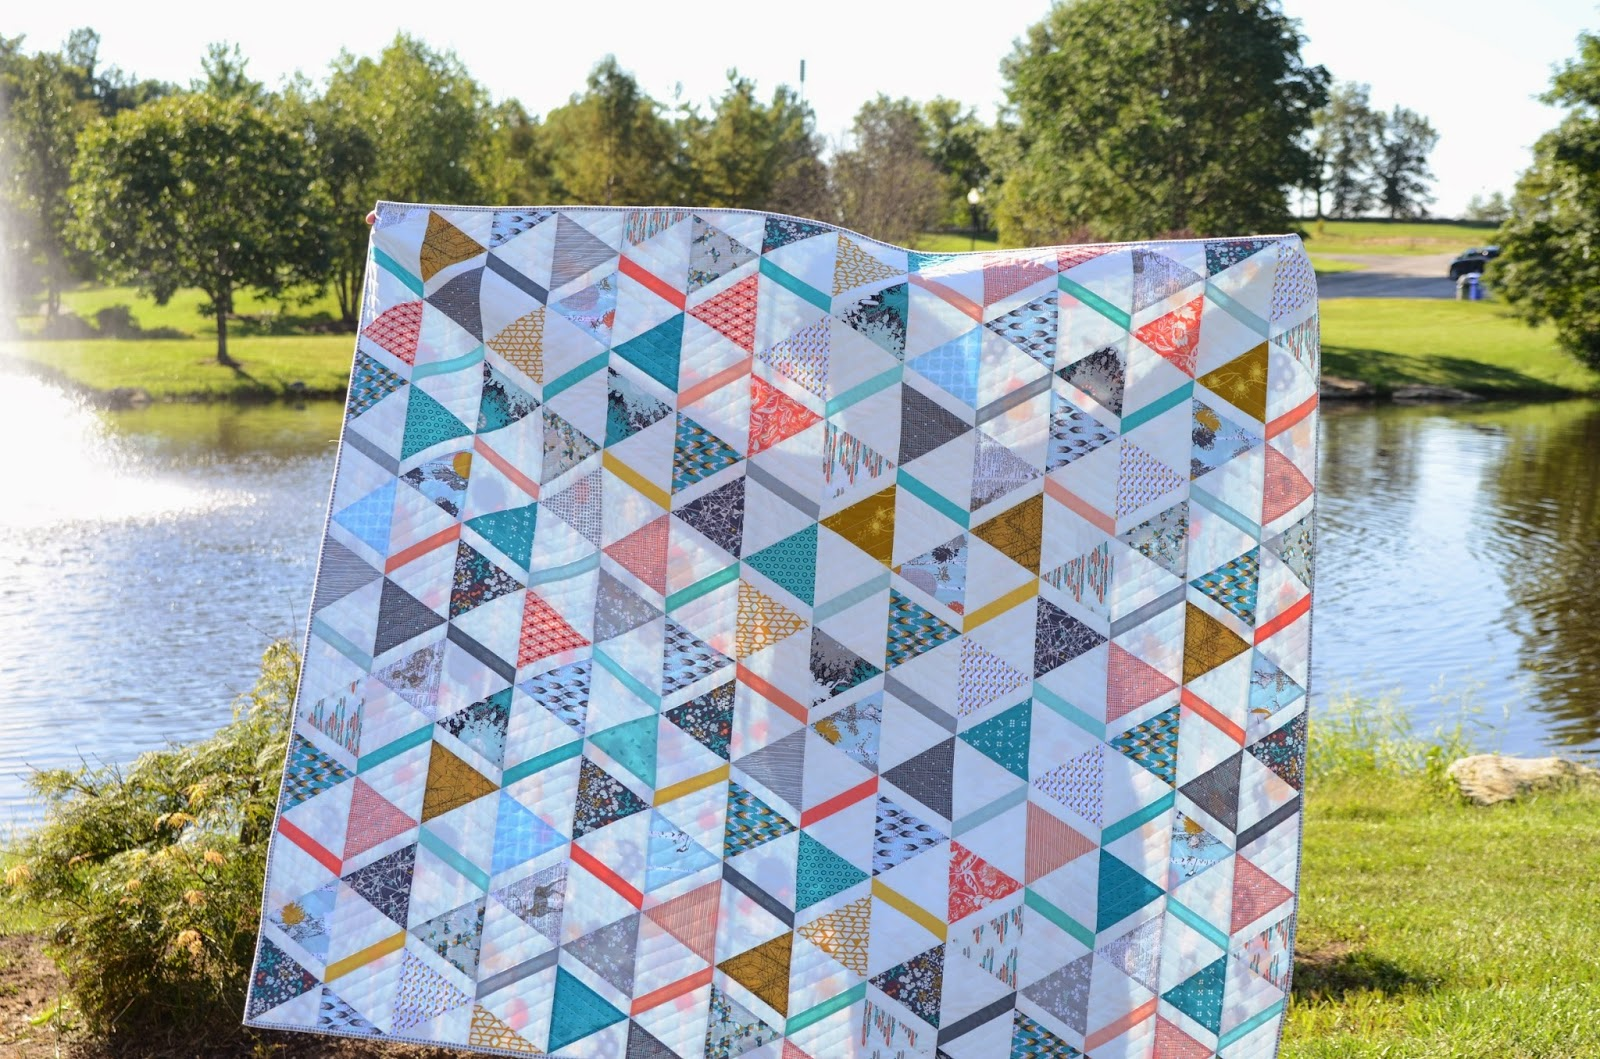 Hyacinth Quilt Designs: The Ladies' Stitching Club : hyacinth quilt designs - Adamdwight.com